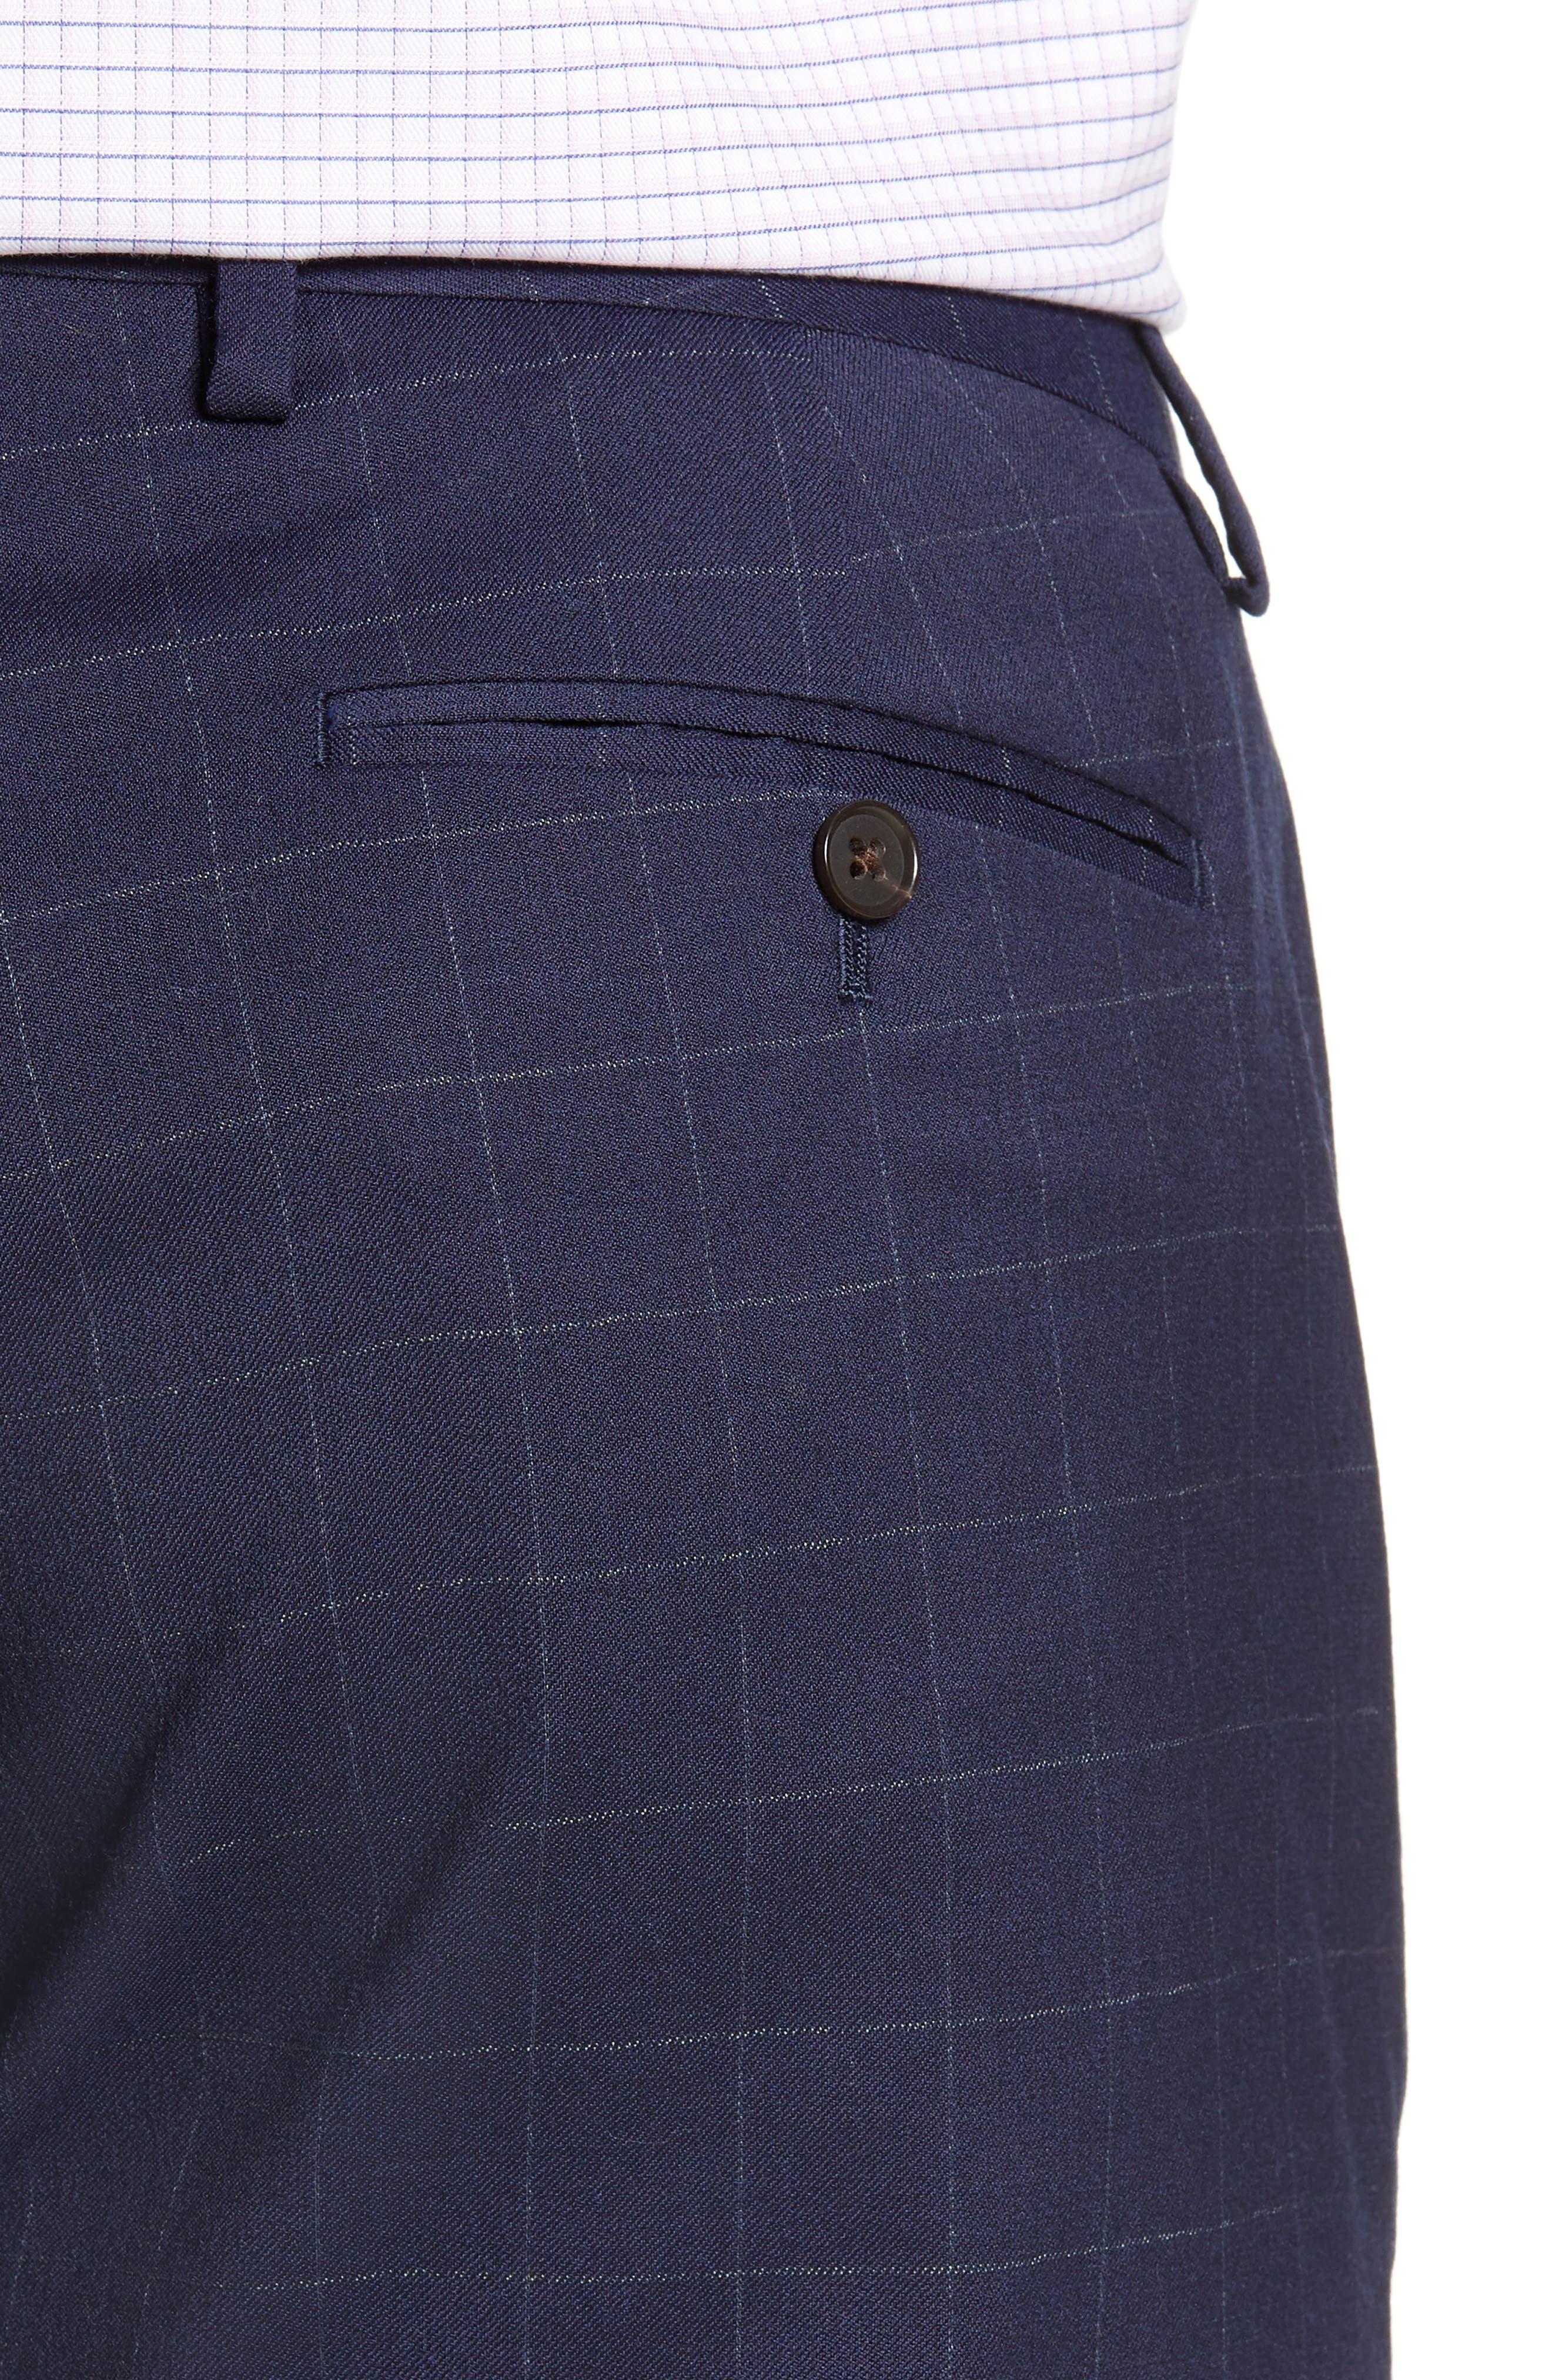 BONOBOS, Jetsetter Slim Fit Stretch Suit Pants, Alternate thumbnail 4, color, NAVY CHALK WINDOWPANE